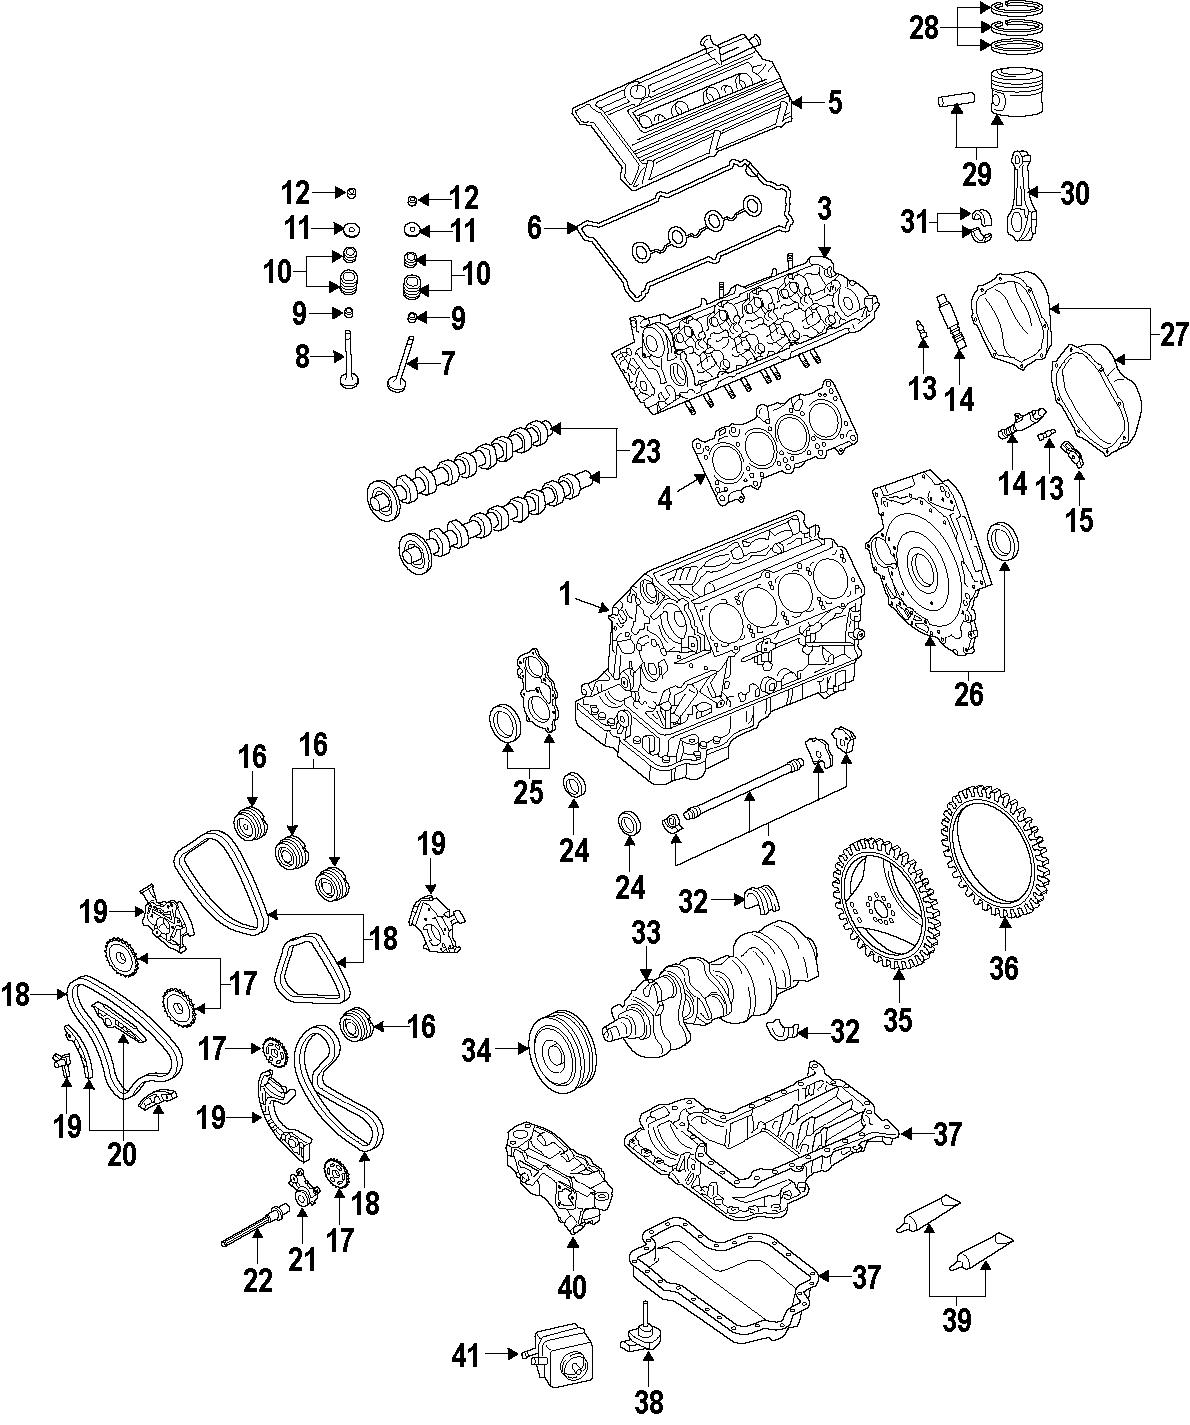 Audi Rs4 Oil Cooler